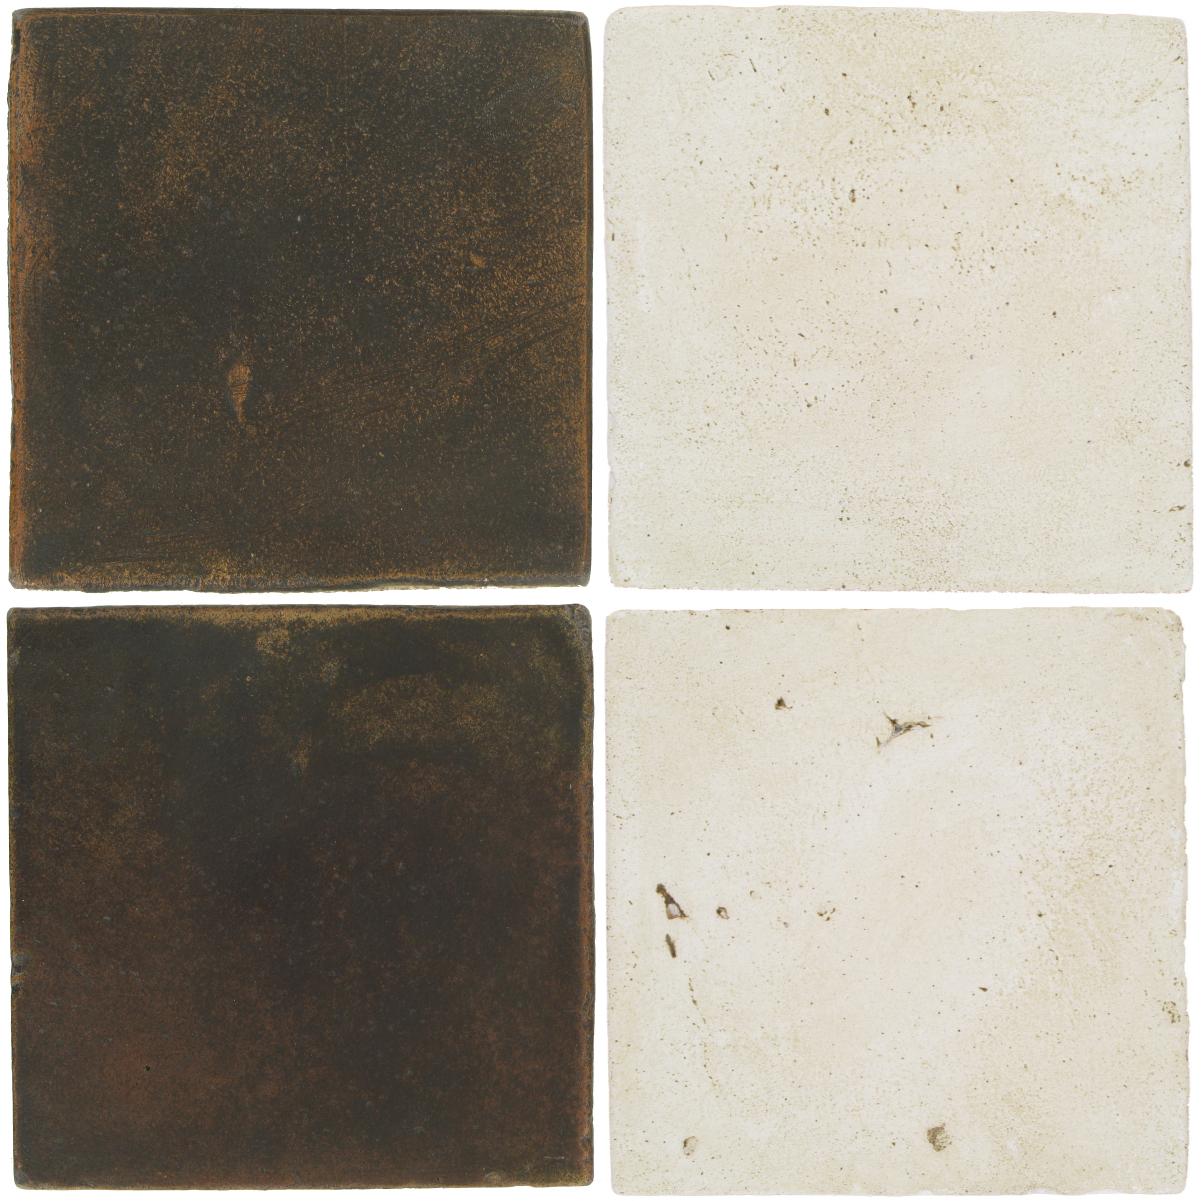 Pedralbes Antique Terracotta  2 Color Combinations  OHS-PSCO Cologne Brown + VTG-PGAW Antique White